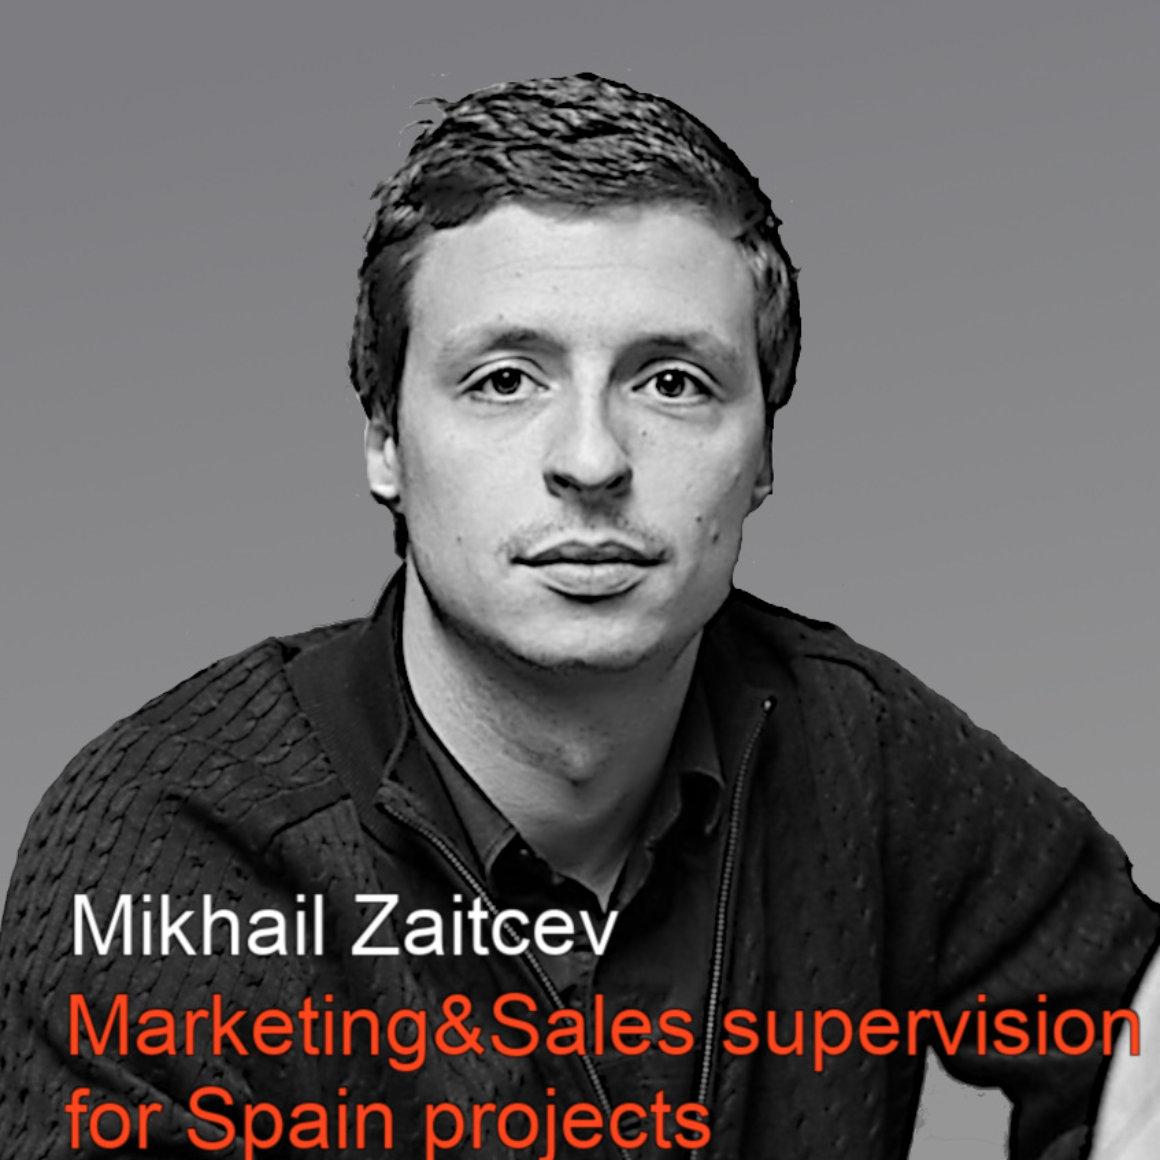 Mikhail Zaitcev BW